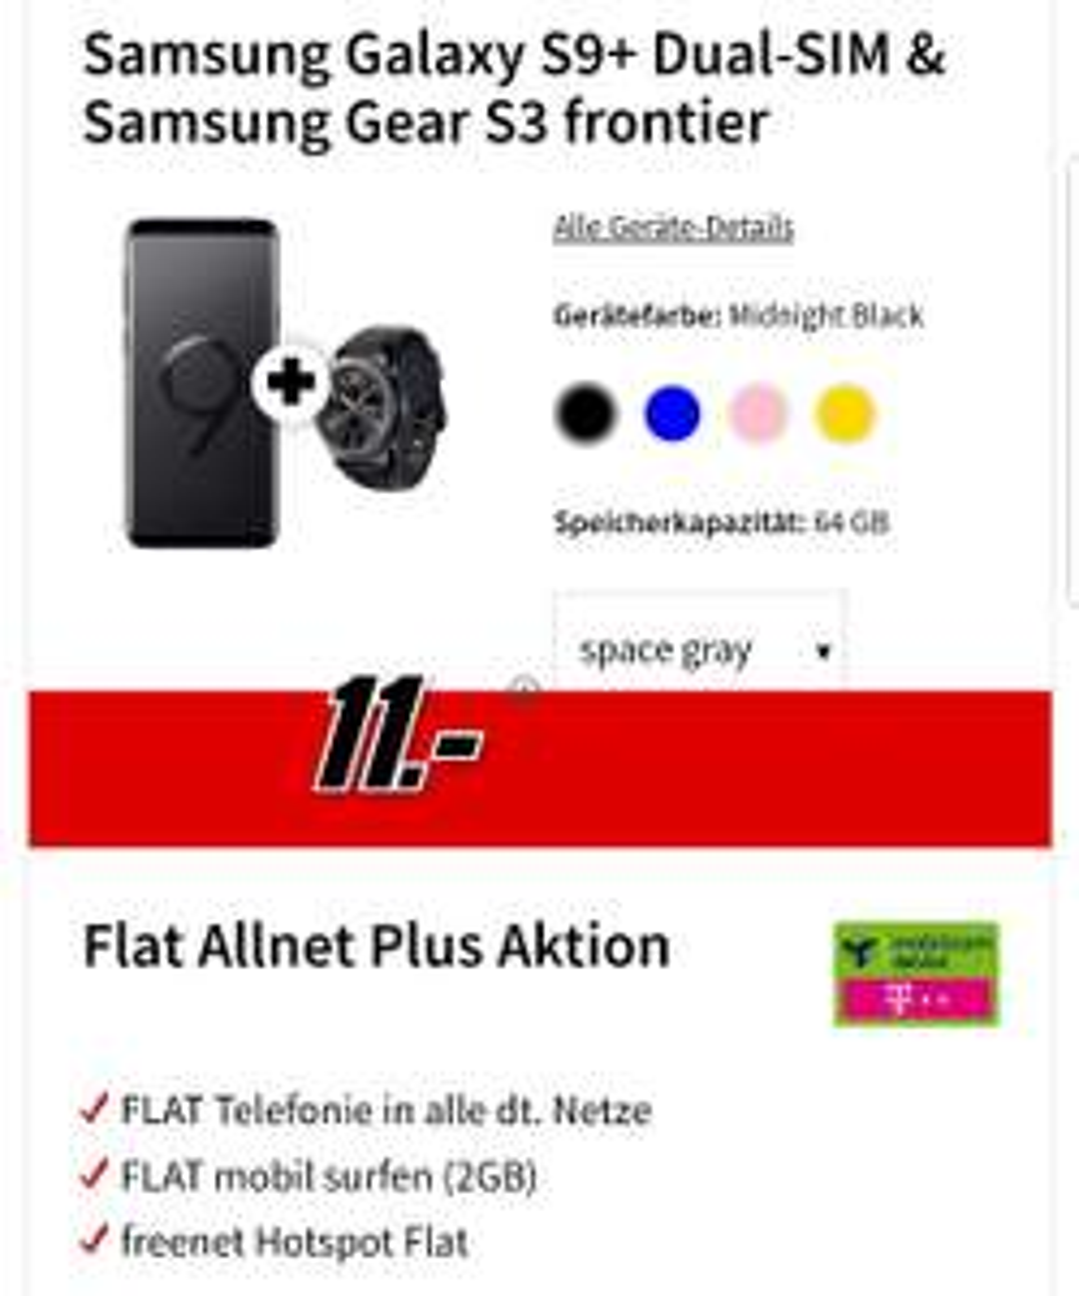 SamsungGalaxy S9+ Dual-SIM& Samsung Gear S3 frontier 2GB Telekom Flat